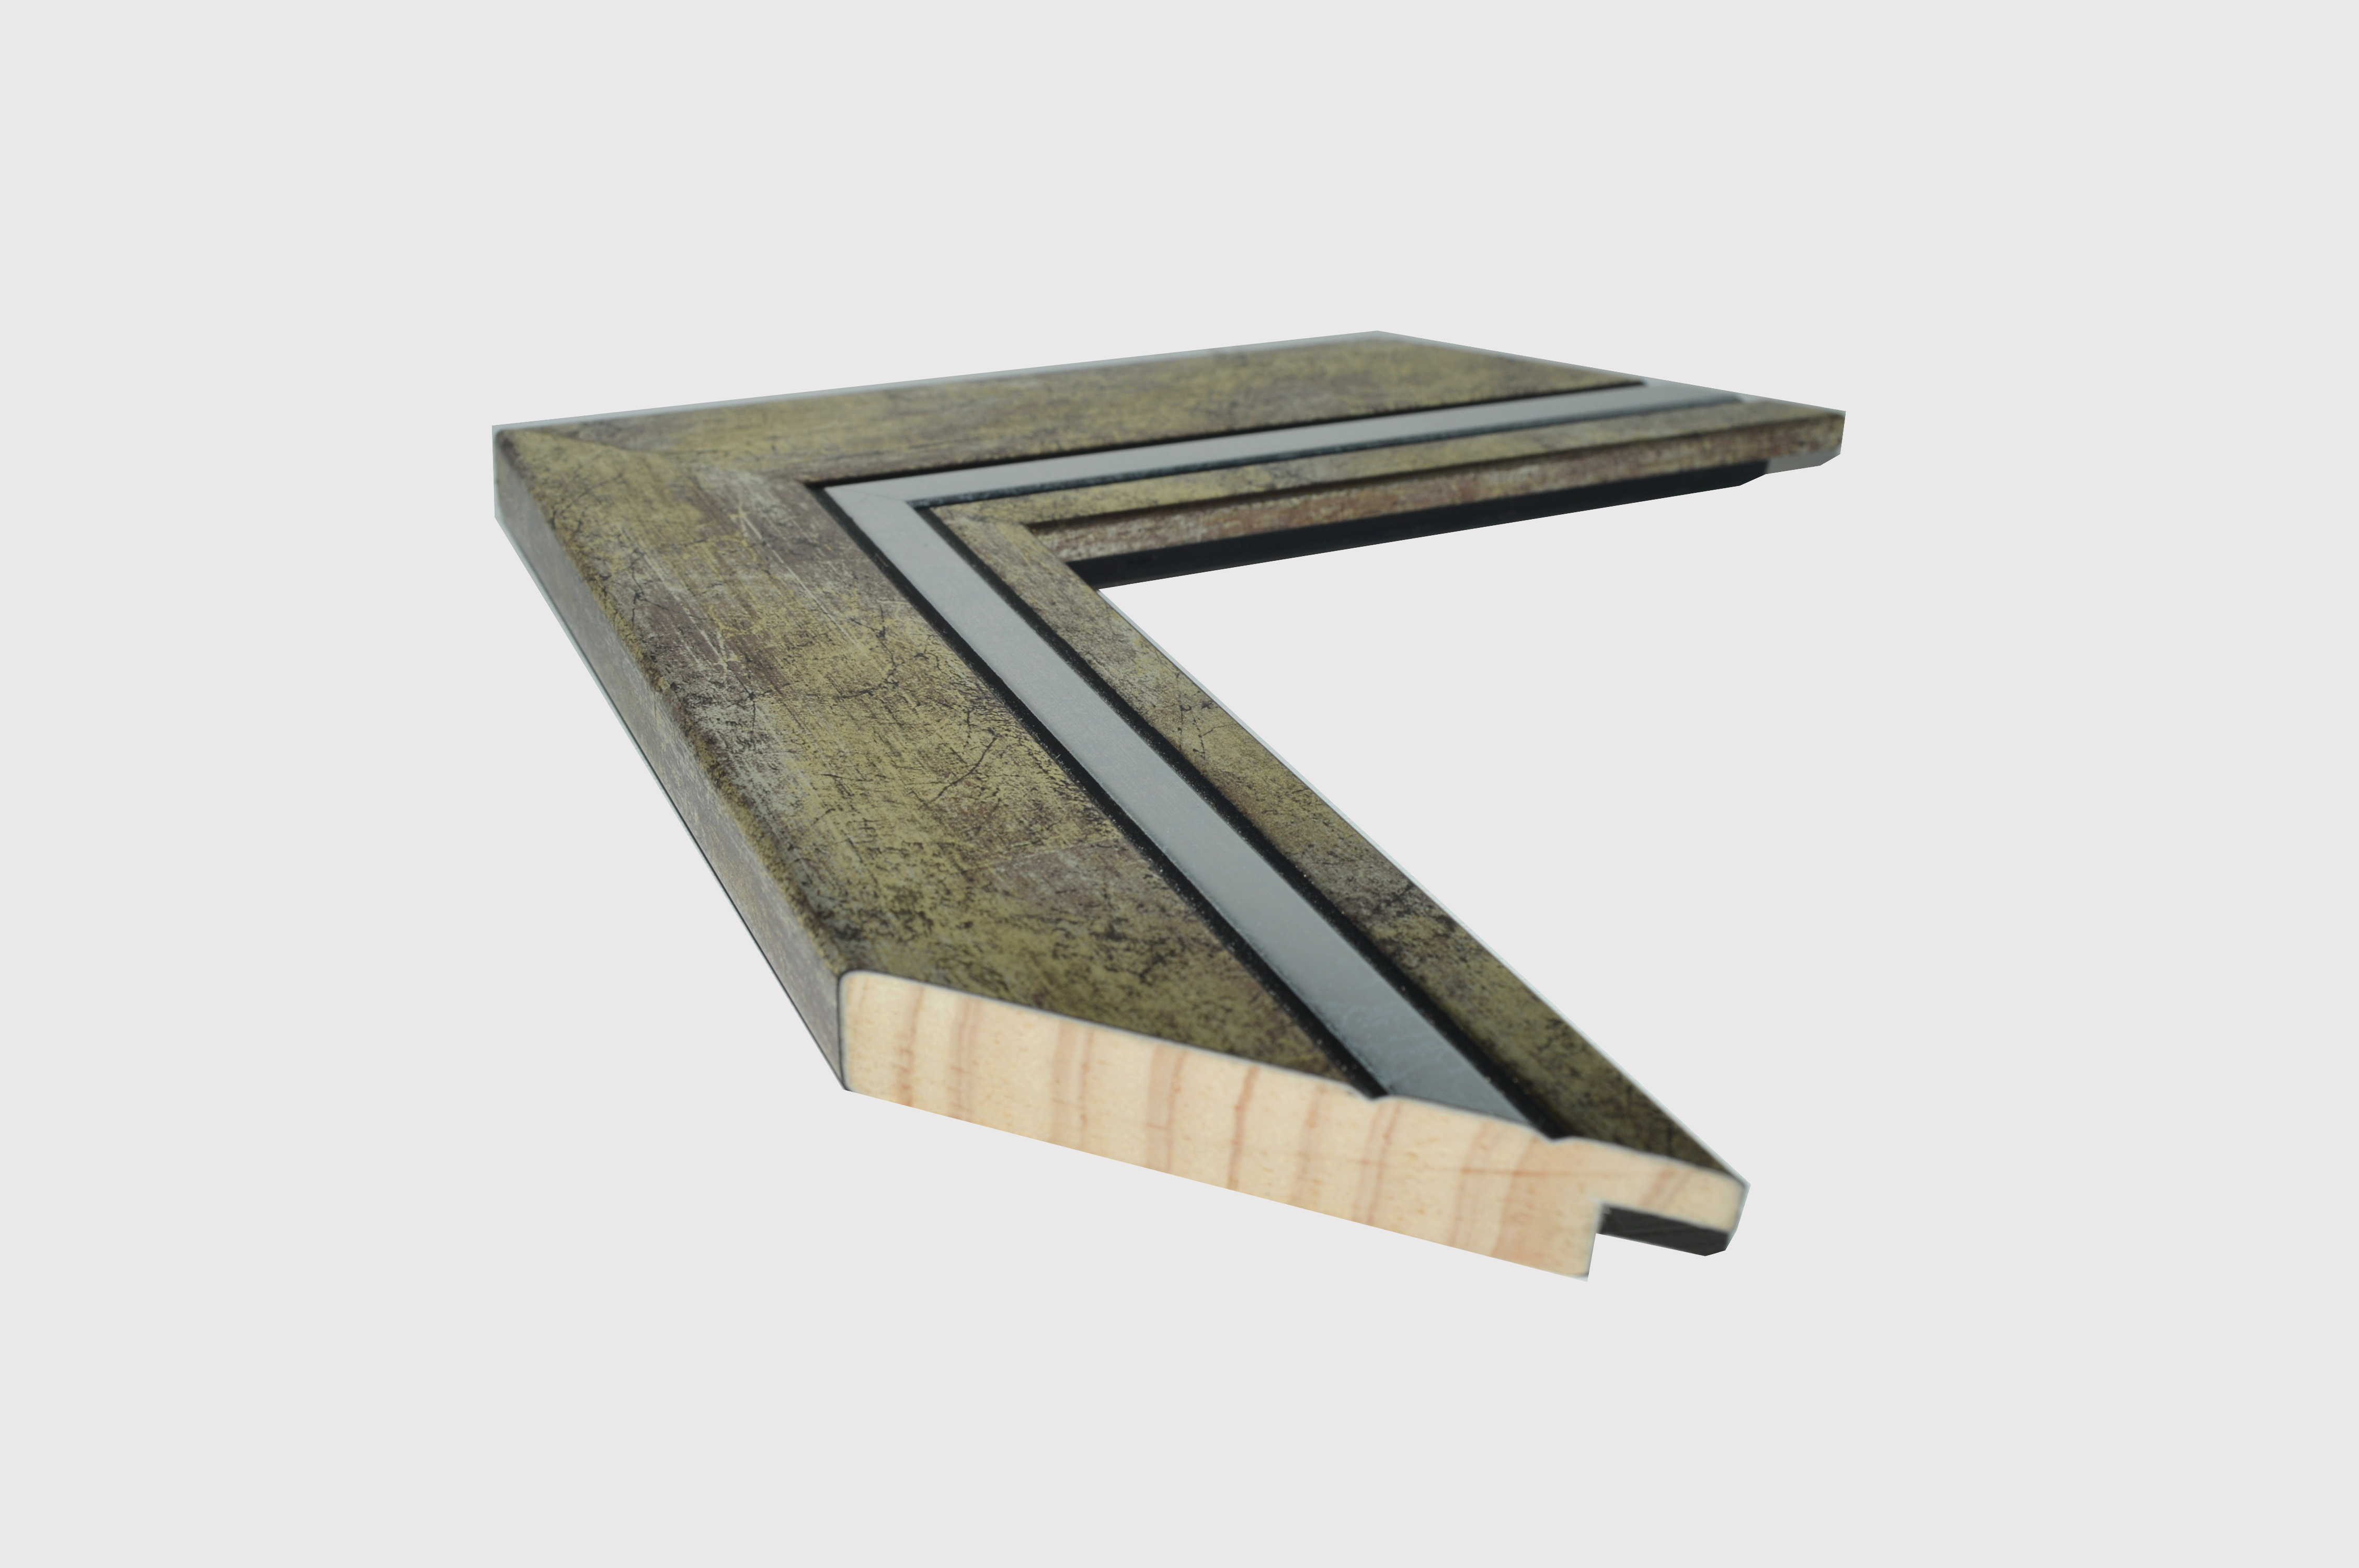 00865-770-PLATA-ancho5.8cm-perfil